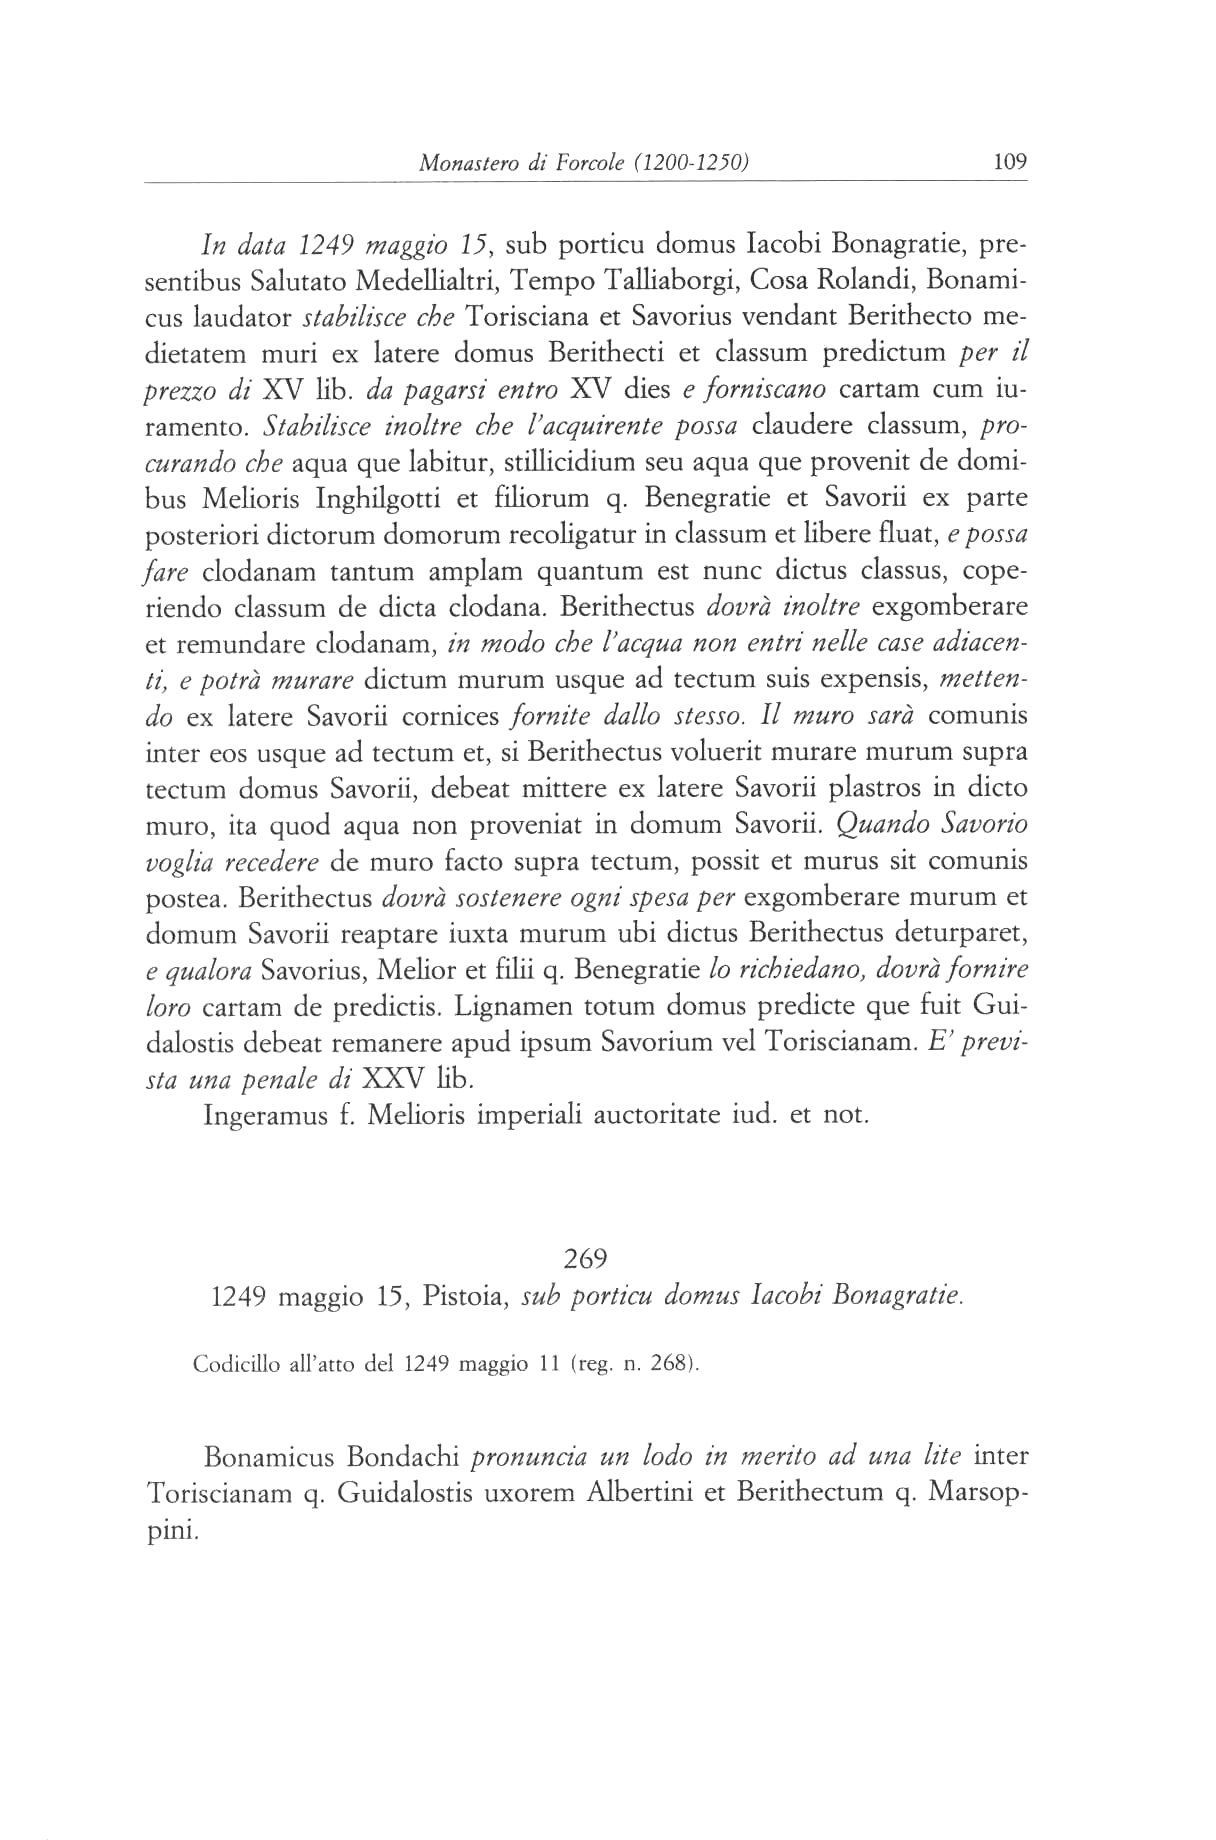 Monastero Forcole 0109.jpg